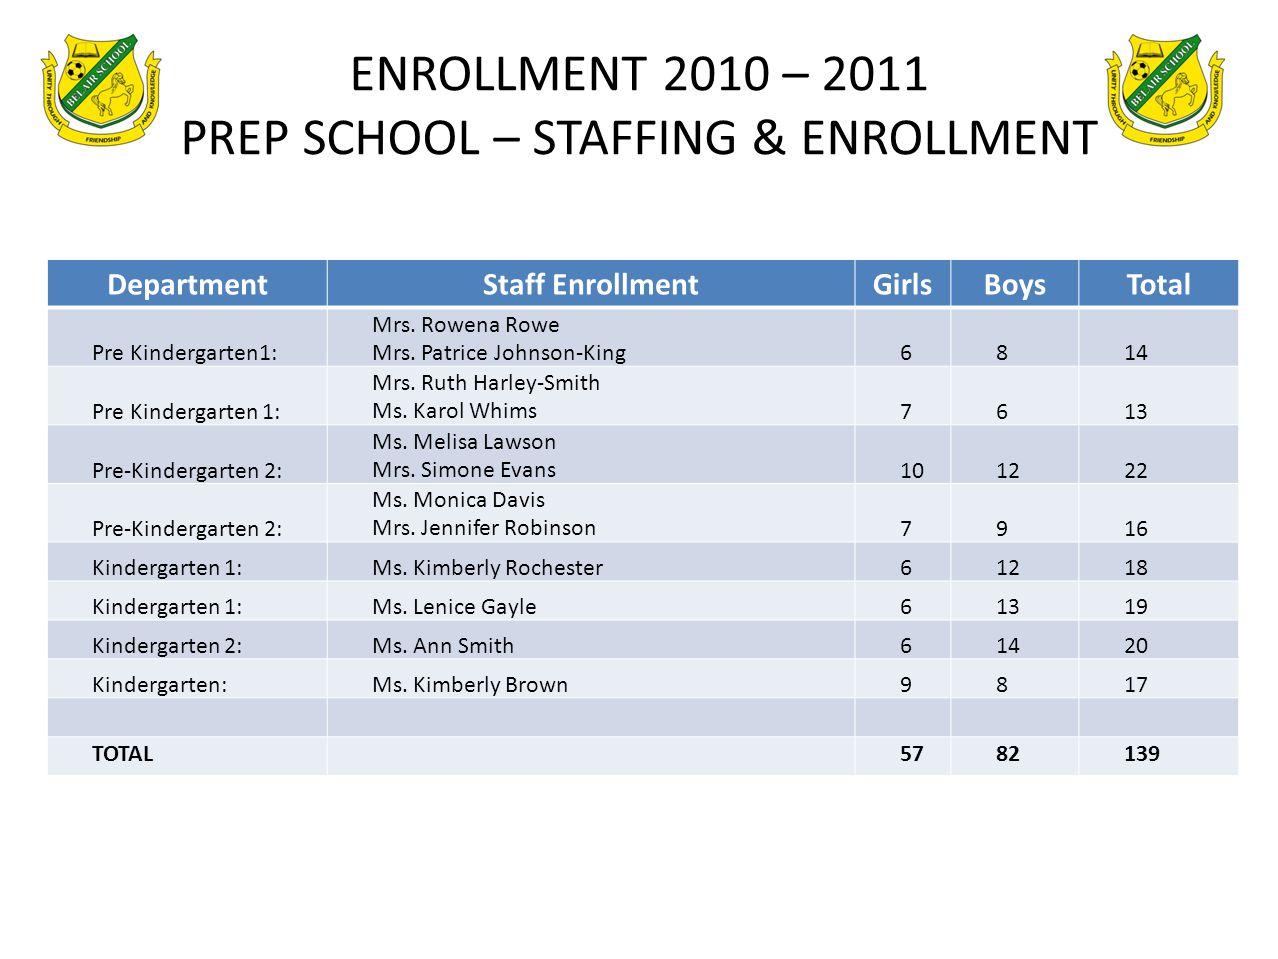 ENROLLMENT 2010 – 2011 PREP SCHOOL – STAFFING & ENROLLMENT DepartmentStaff EnrollmentGirlsBoysTotal Pre Kindergarten1: Mrs. Rowena Rowe Mrs. Patrice J